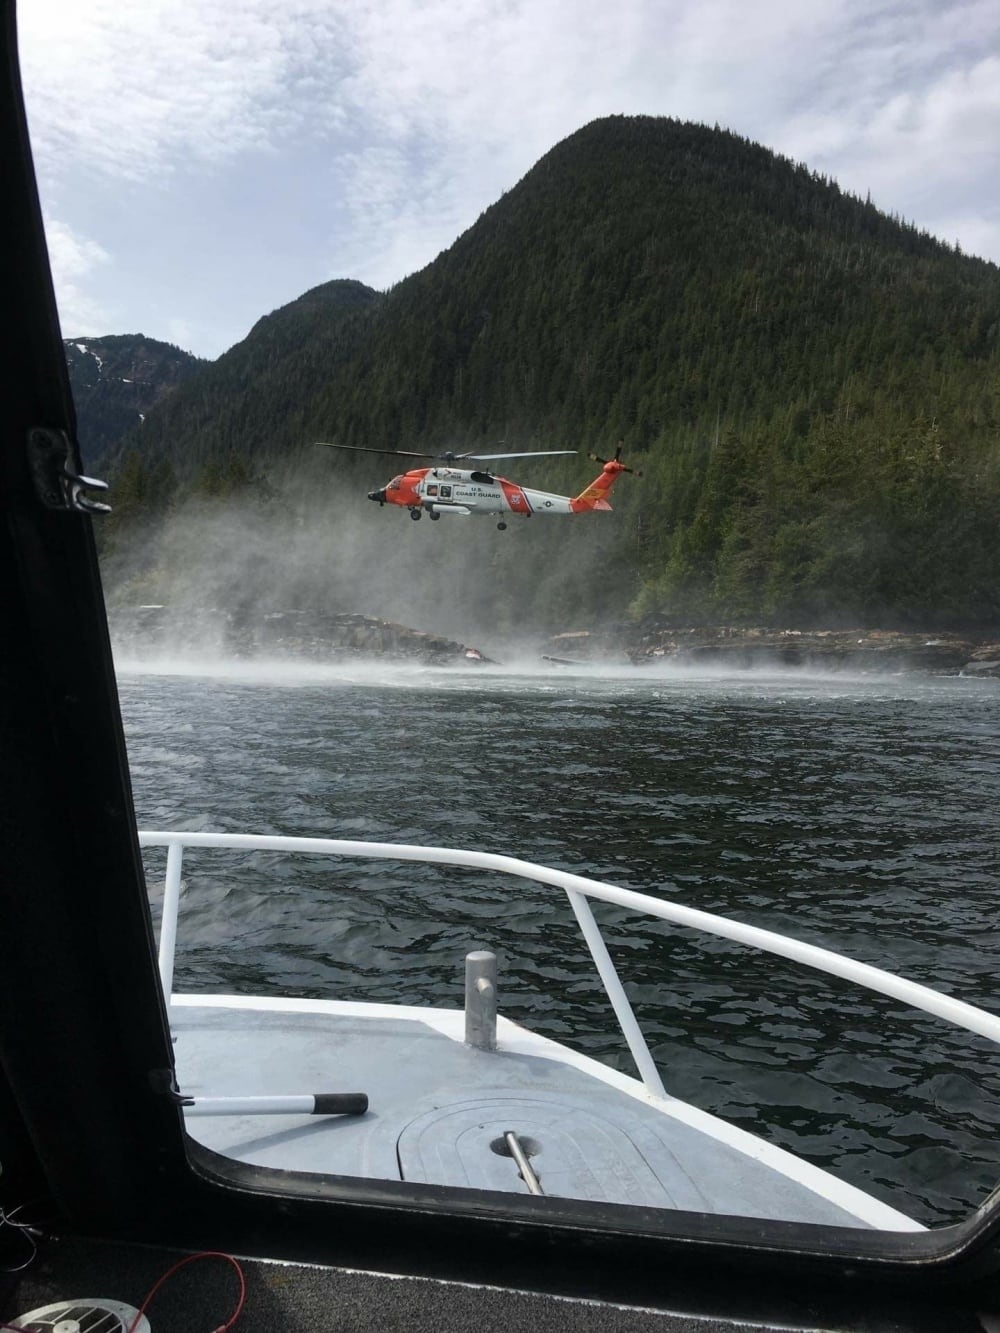 Alaska floatplane collision death toll rises to 6, including